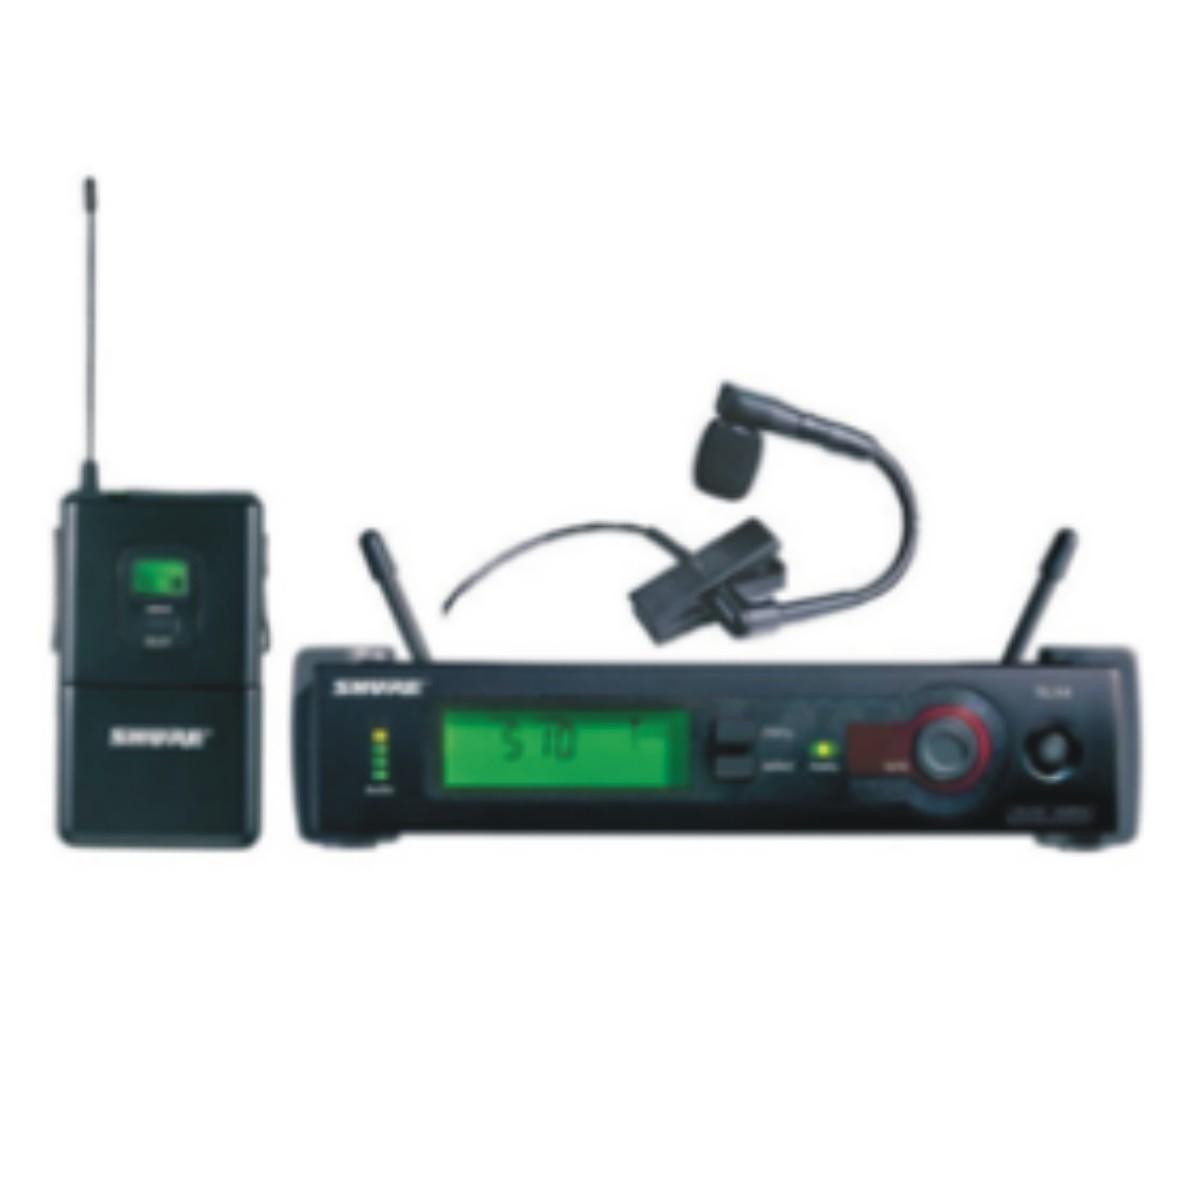 QLXD14/WL93 领夹式无线数字麦克风系统